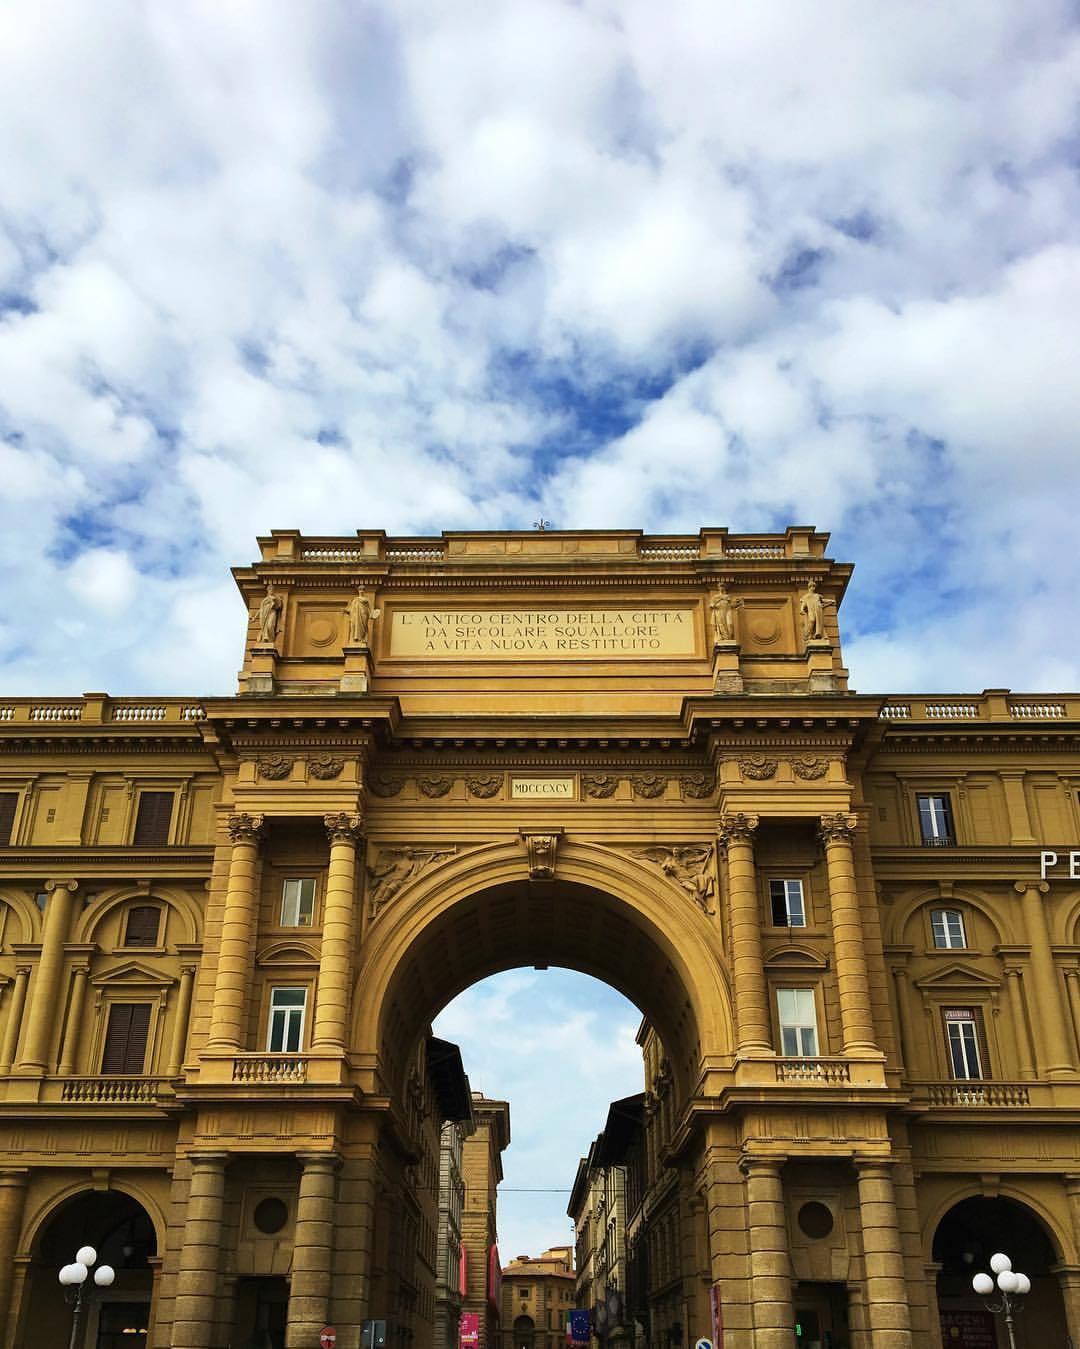 Sunday funday! #sundayfunday #florence #piazzalife #italy (at Piazza della Repubblica, Florence)